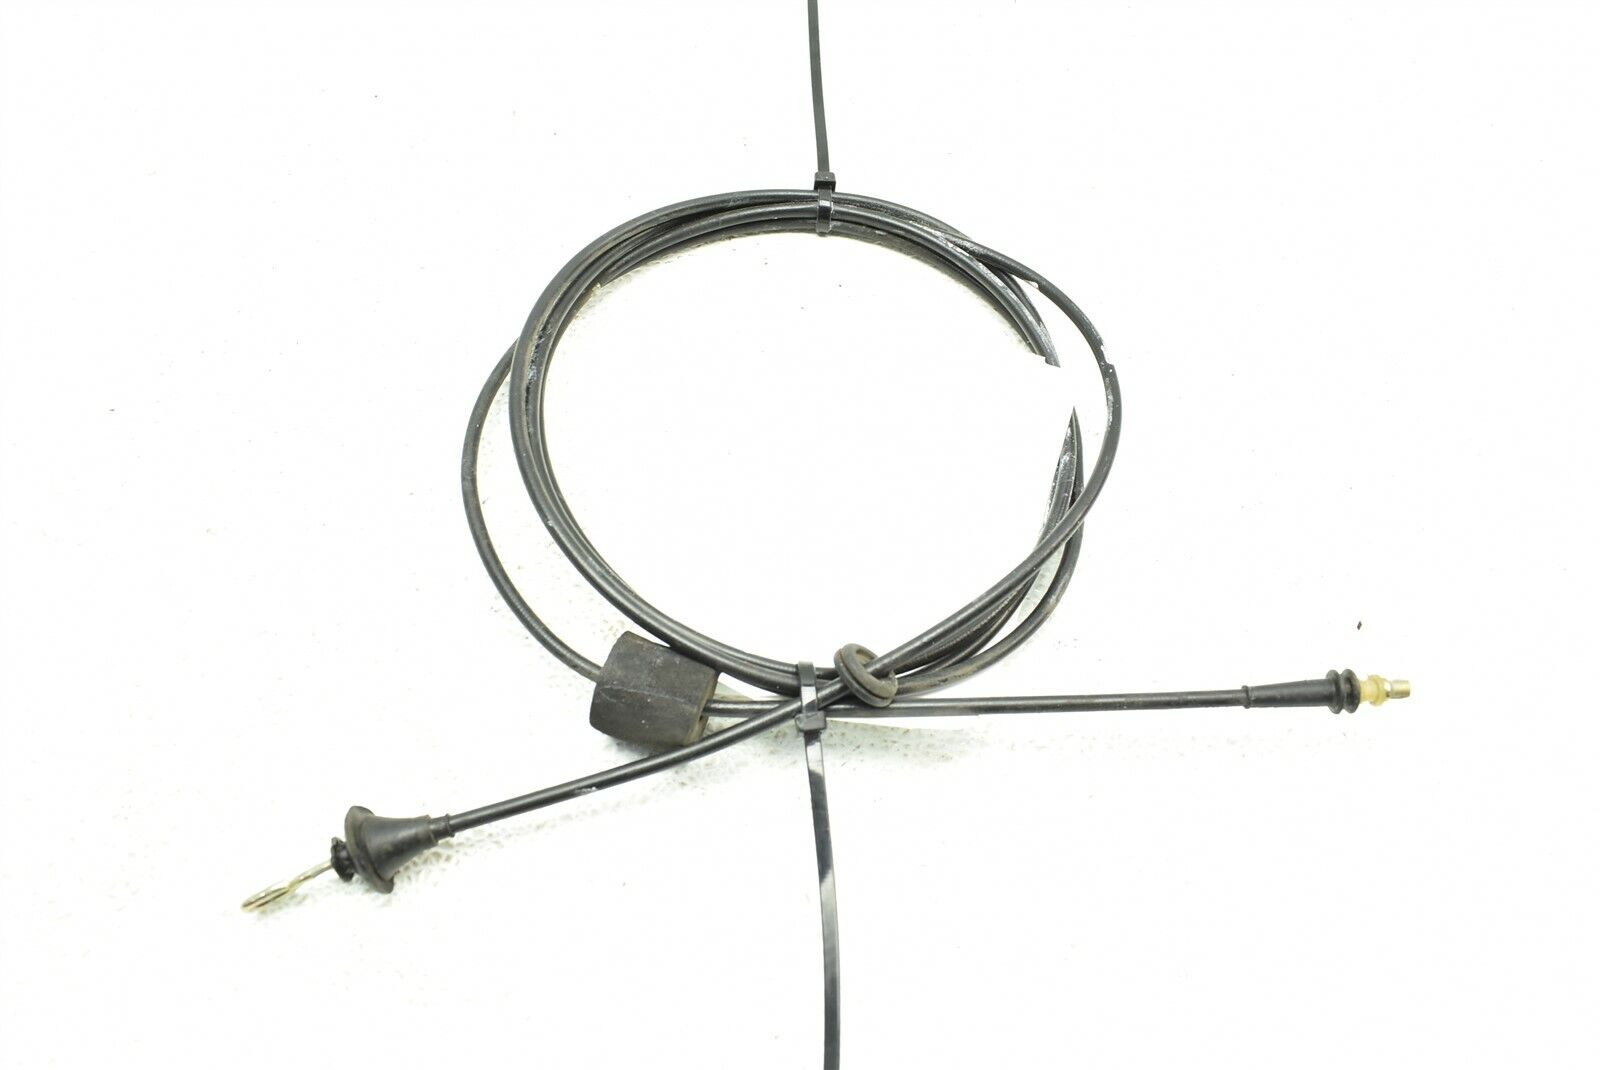 Porsche Boxster 911 Hood Release Cable 97 04